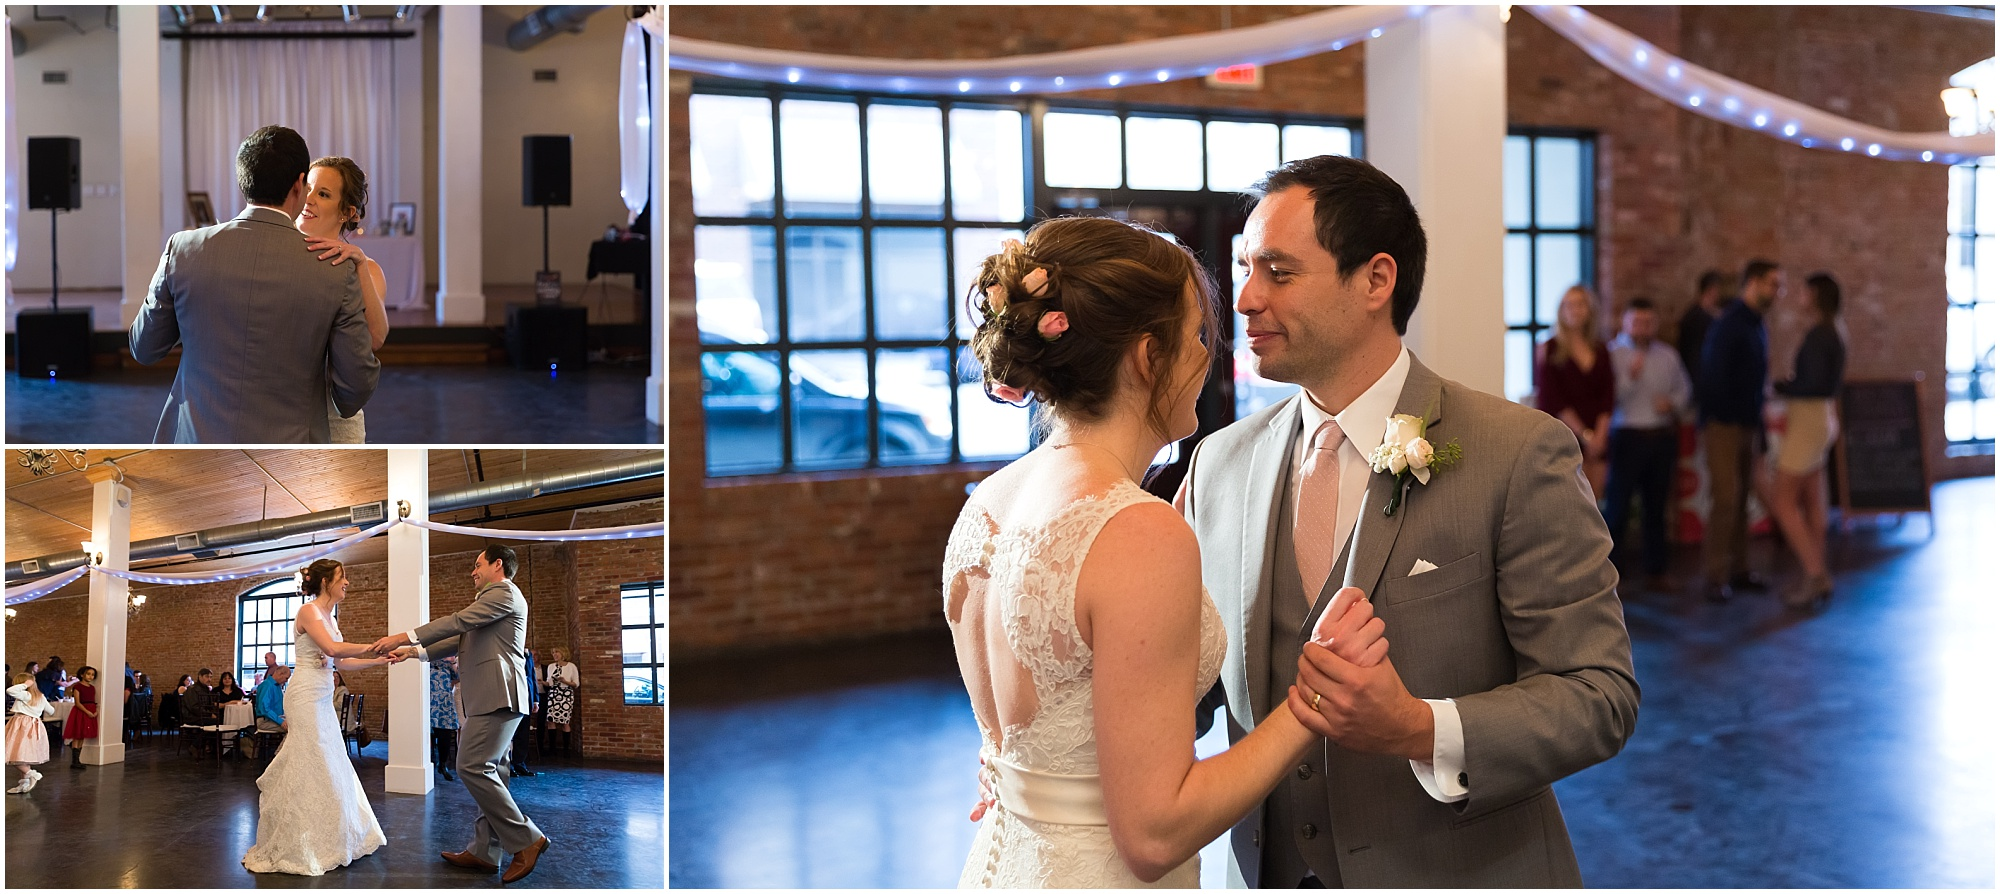 Bride and groom share a first dance at their downtown Waco reception at The Palladium - Jason & Melaina Photography - www.jasonandmelaina.com